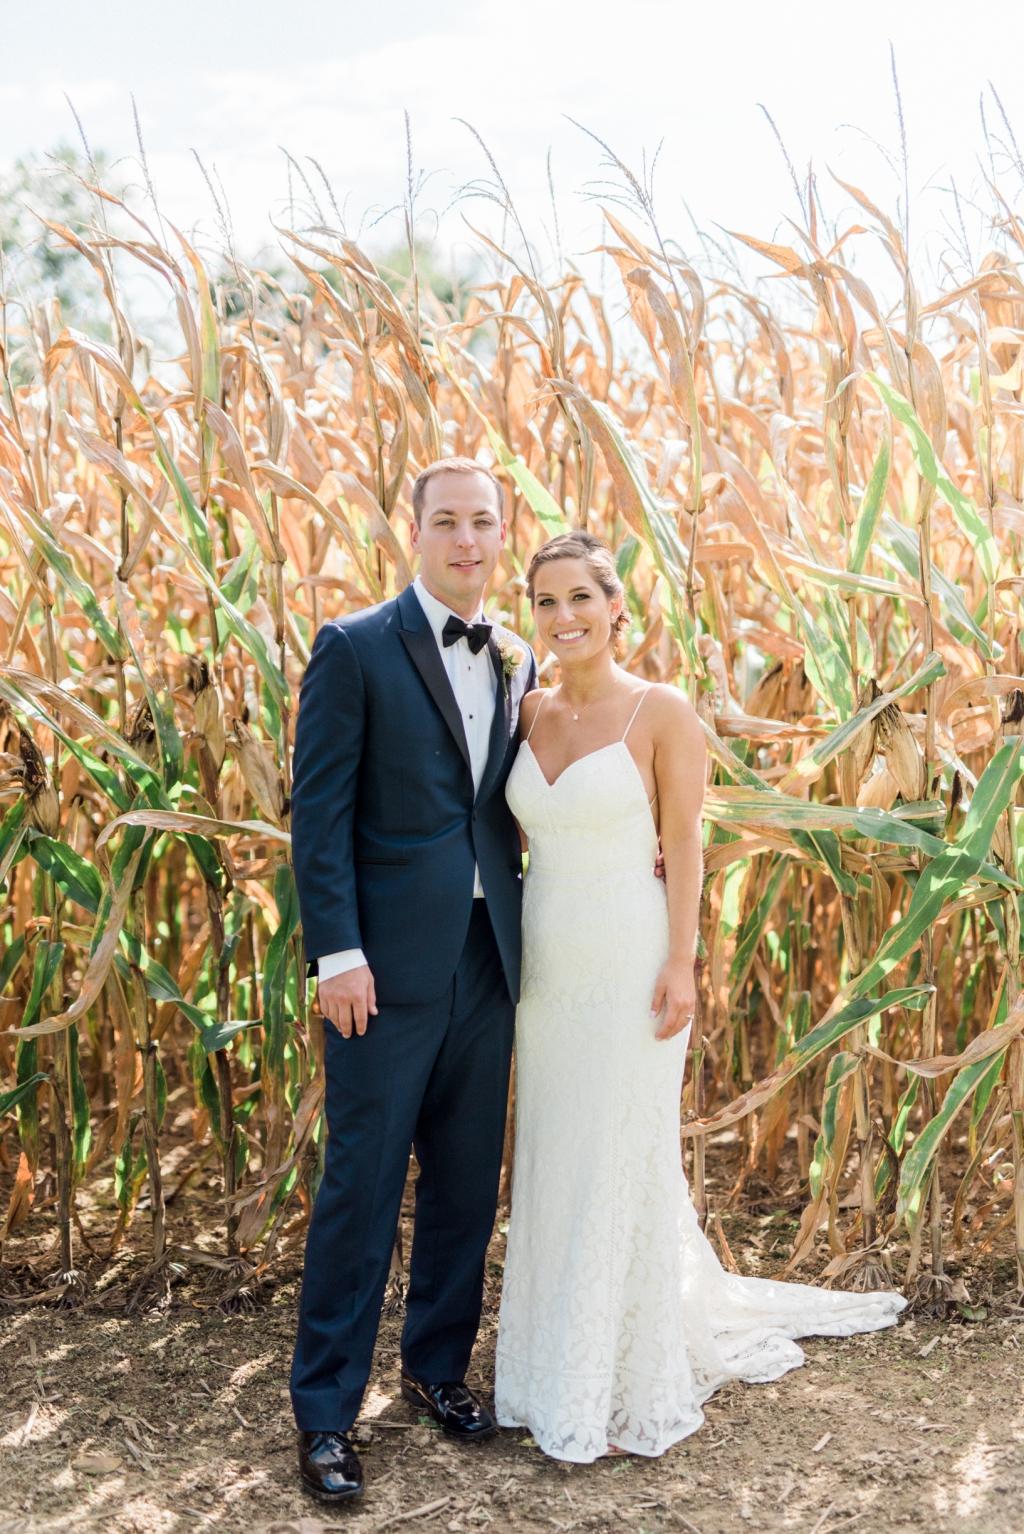 haley-richter-photography-buena-vista-confrence-center-wedding-summer-084